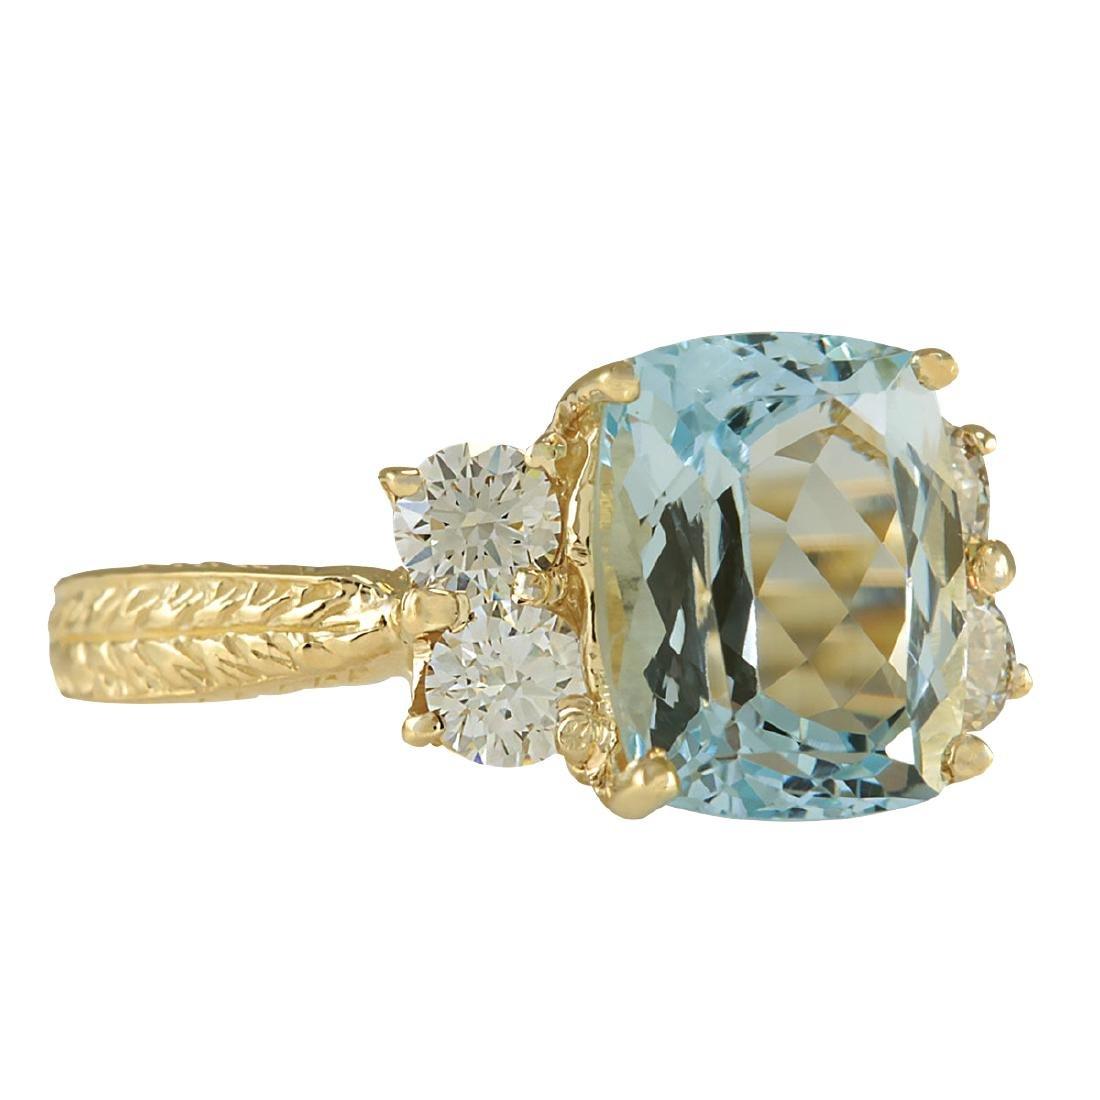 3.67CTW Natural Aquamarine And Diamond Ring In 18K - 2